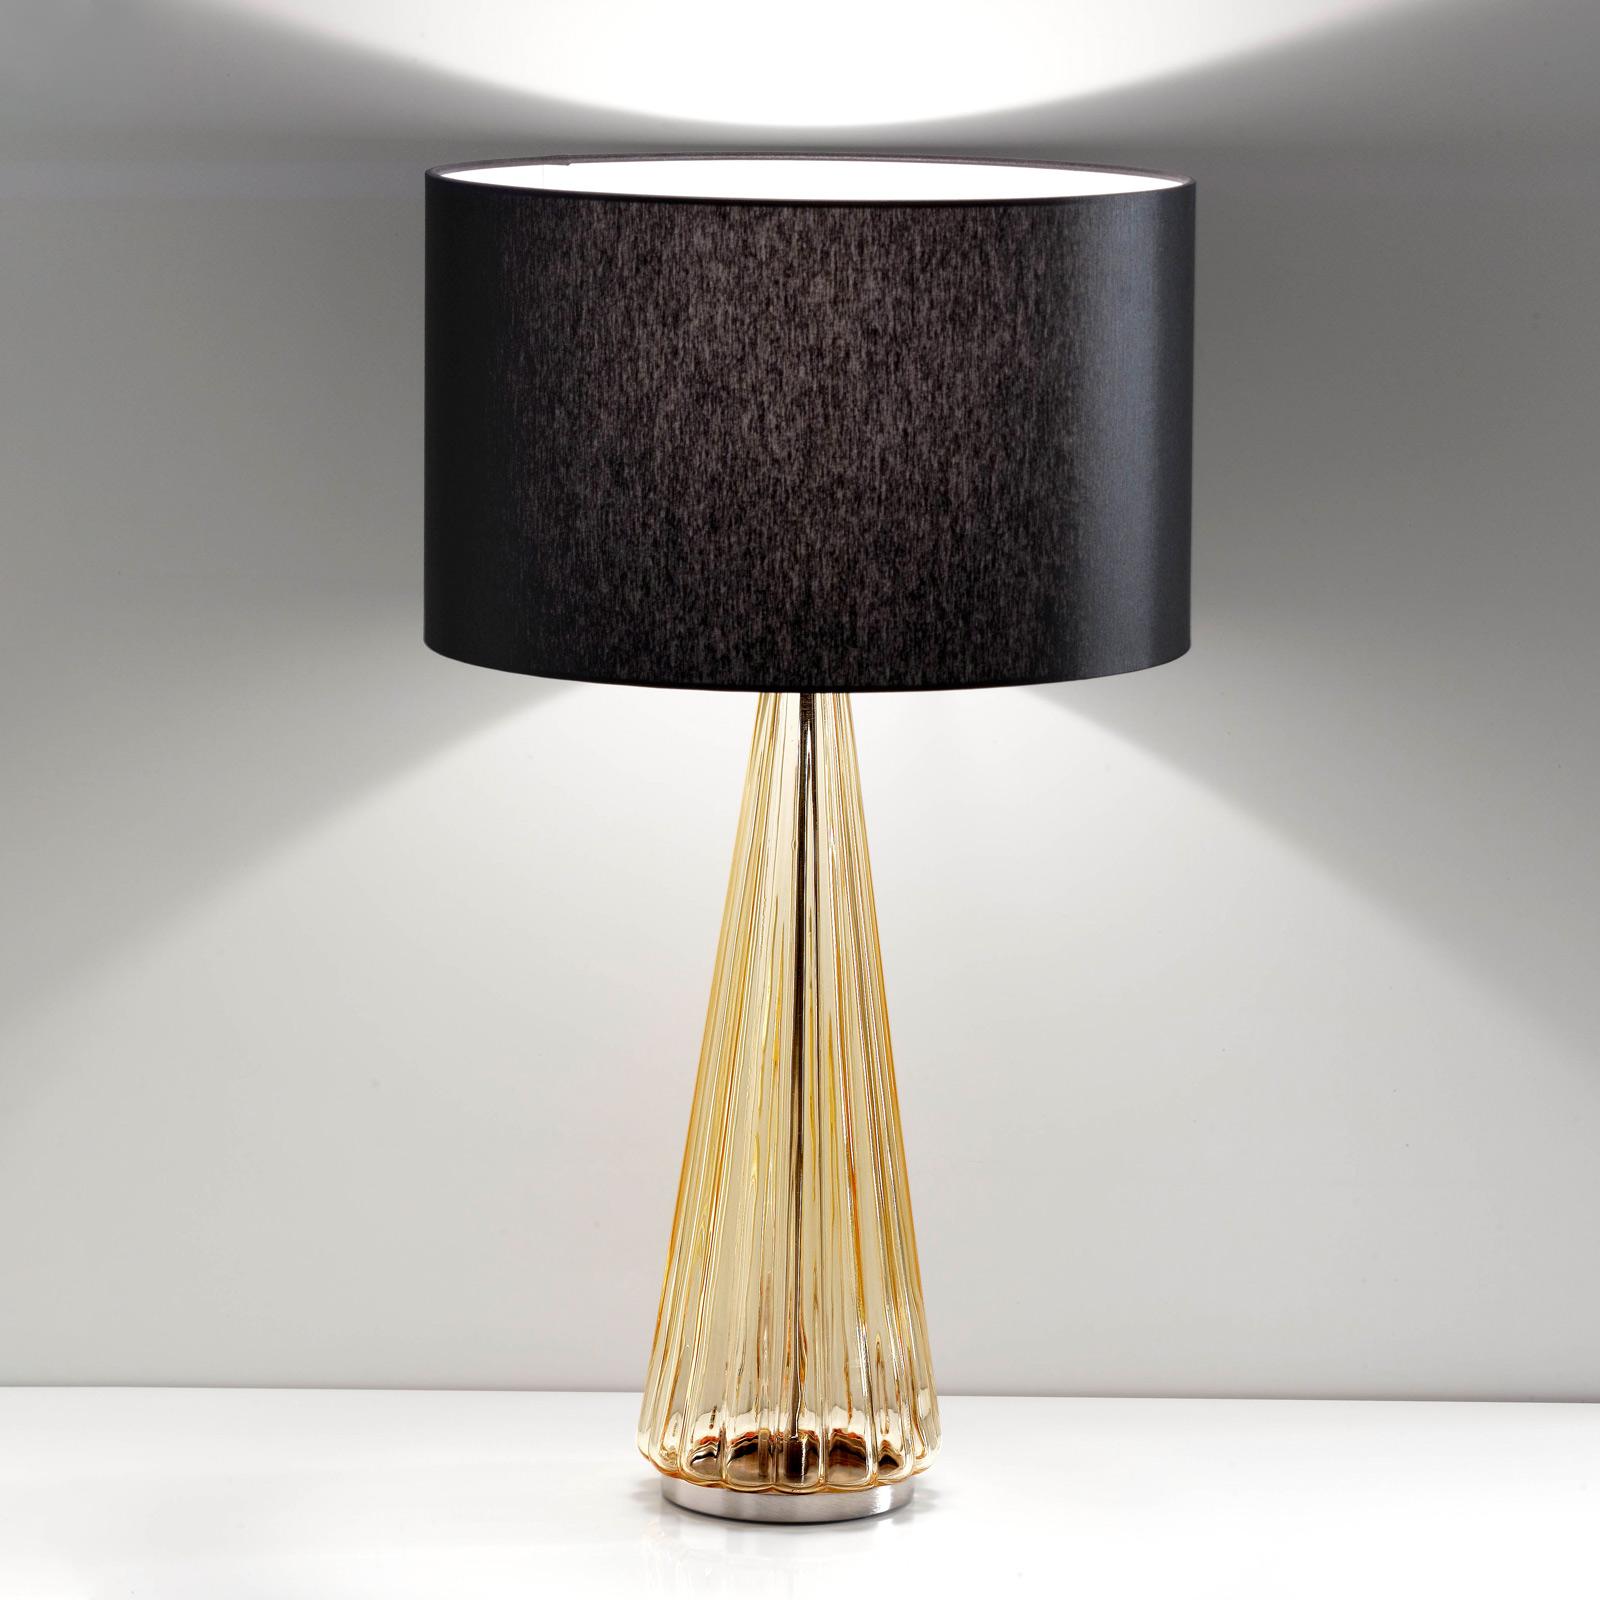 Tafellamp Costa Rica kap zwart, voet amber